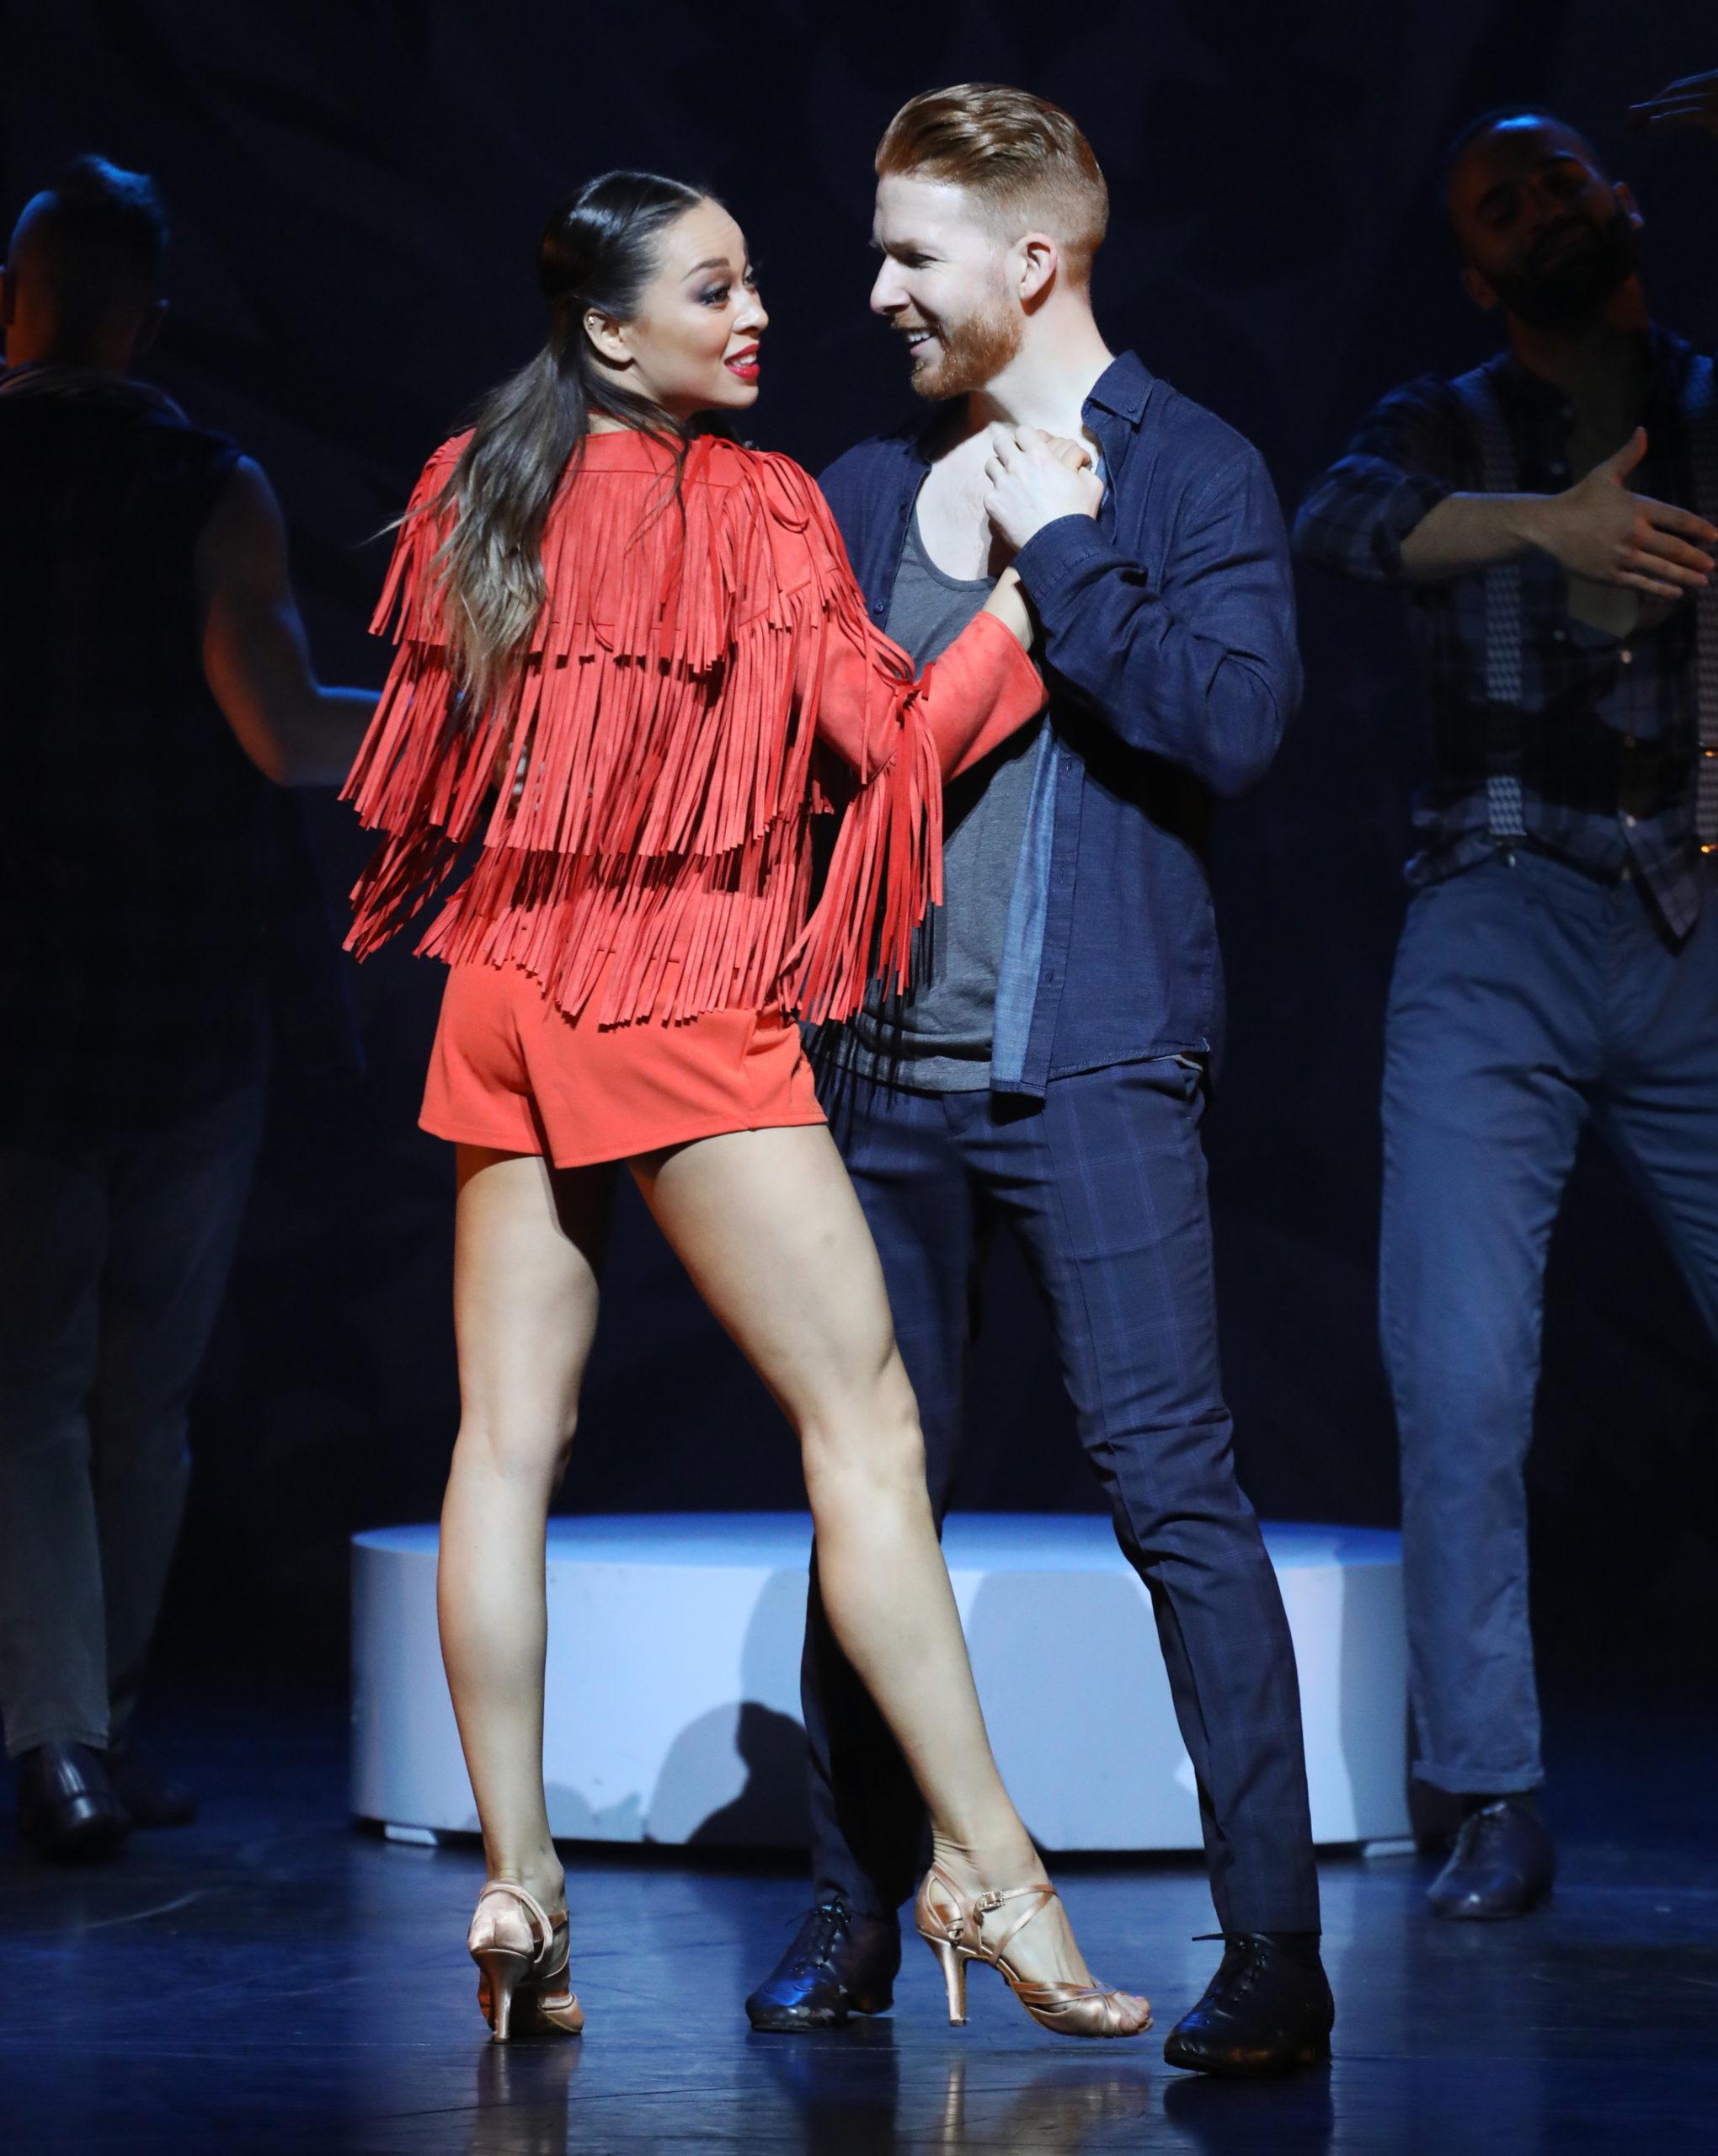 Neil Jones and Katya were together for six years before splitting